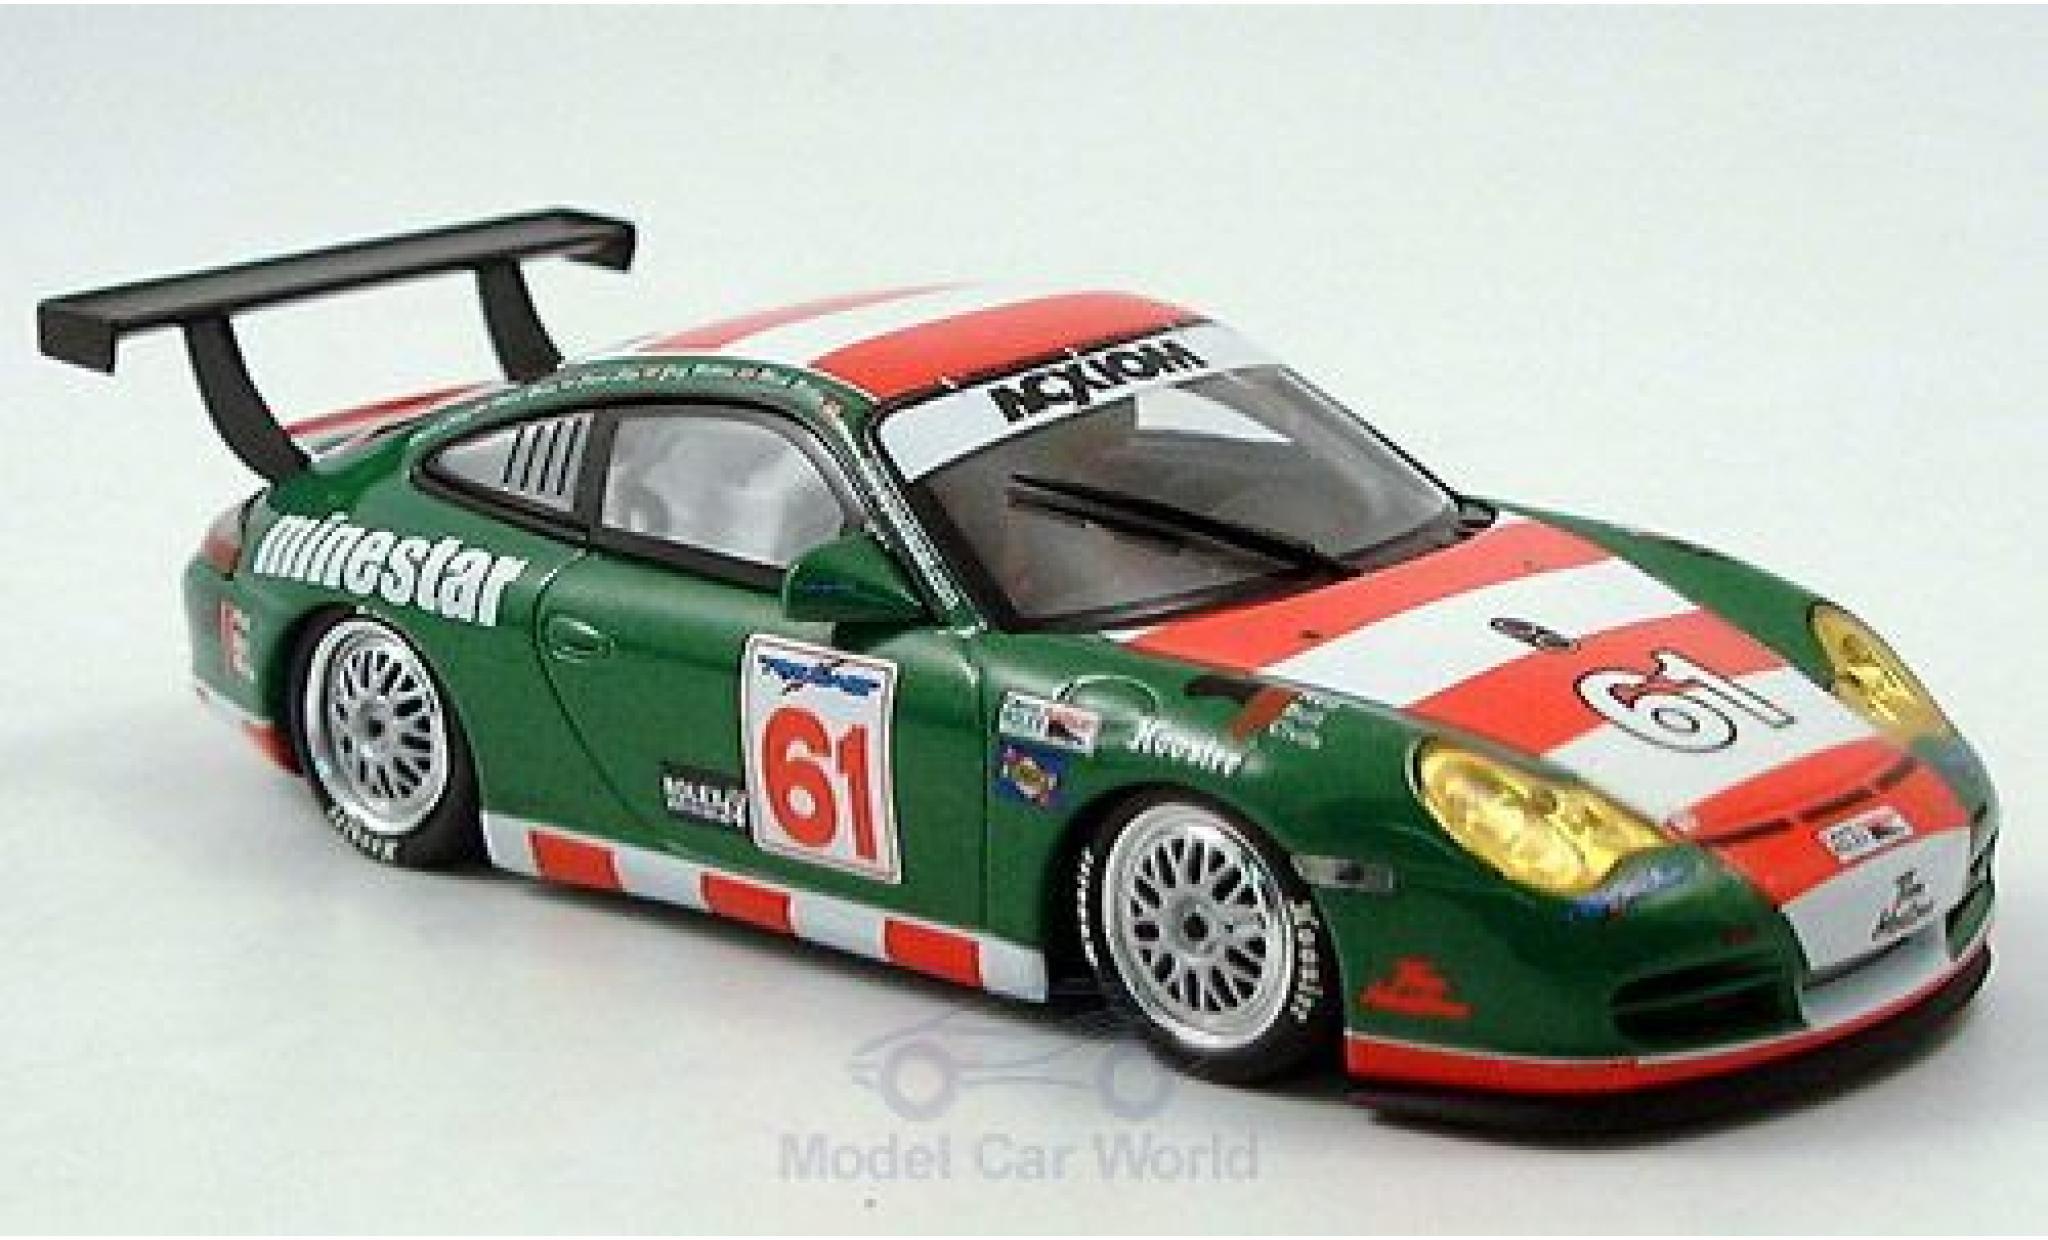 Porsche 996 SC 1/43 Minichamps (996) GT3 No.61 The Racers Group East 24h Daytona 2005 Nearn/Lacey/Shep/Wilkins